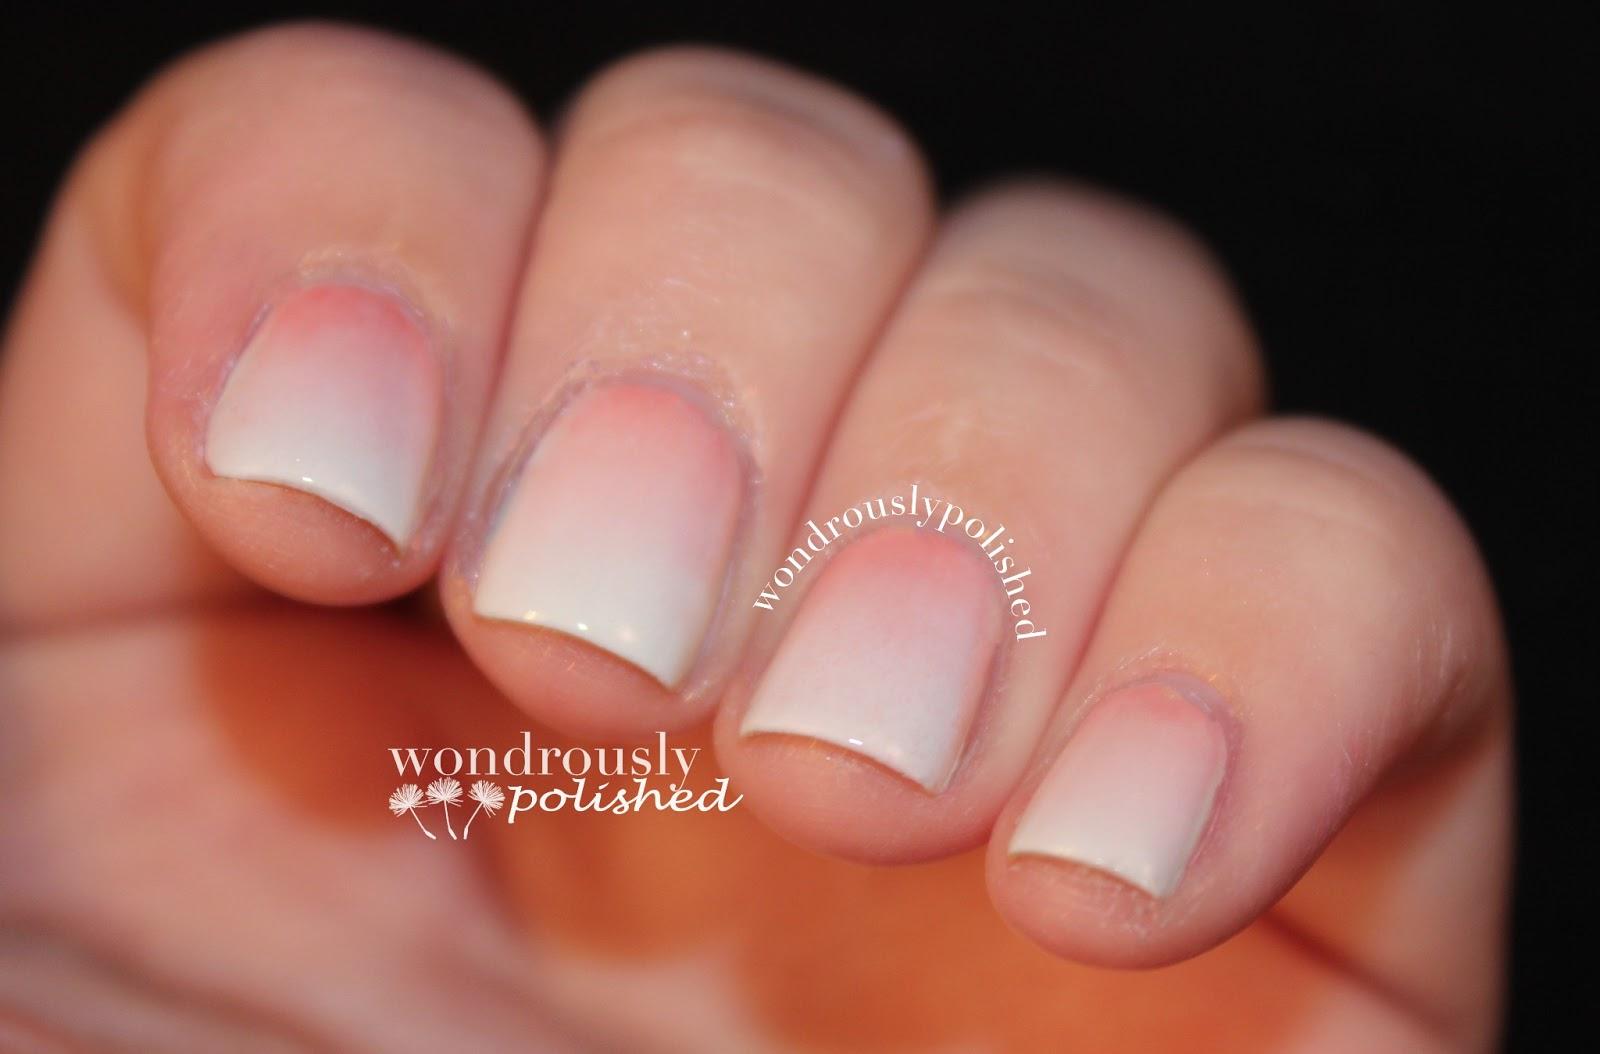 Wondrously Polished March Nail Art Challenge Day 3